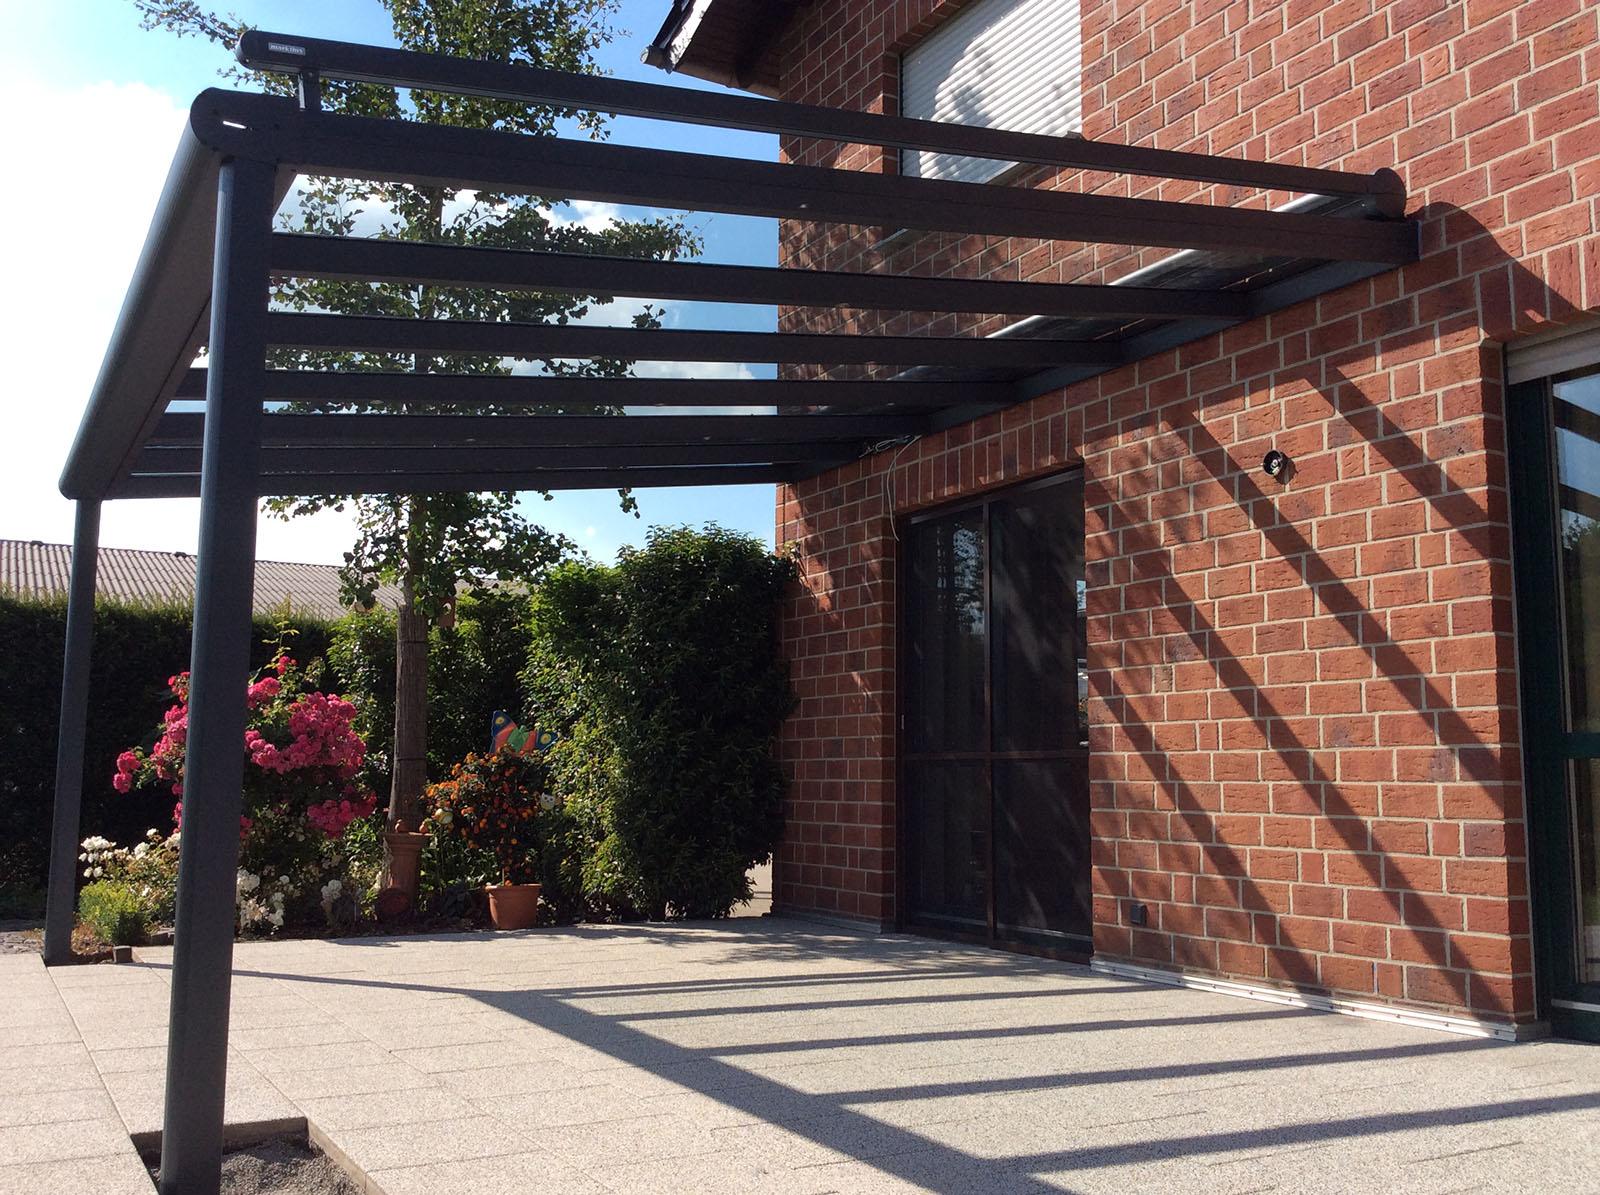 terrassenüberdachung alu 10mm sicherheitsglas vsg glas klar 10m, Hause deko